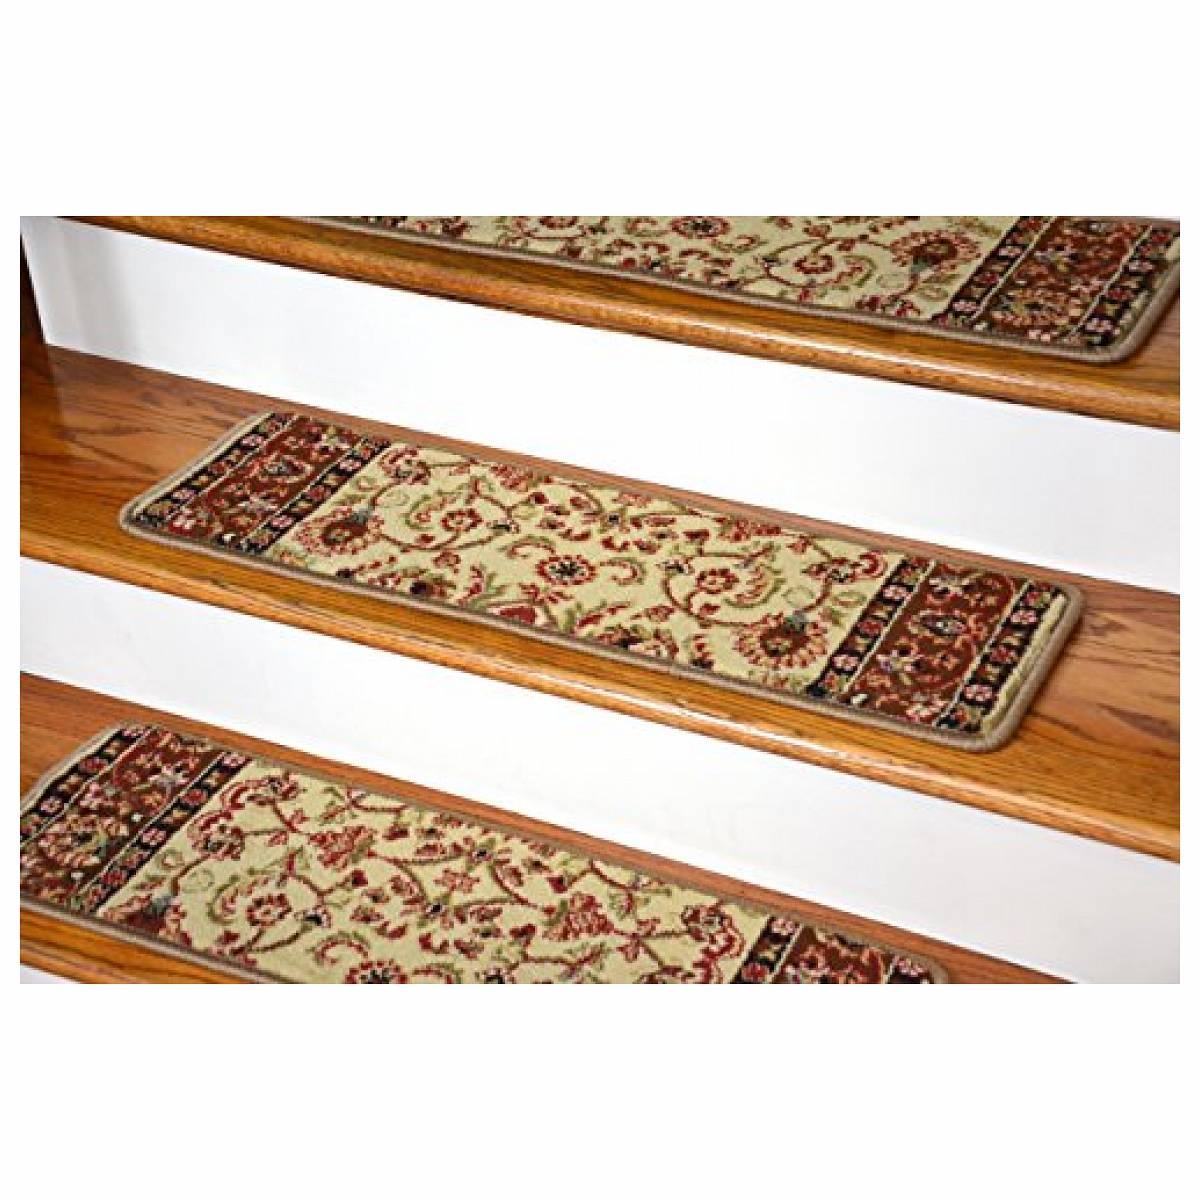 Rugs Carpet Elegant Carpet Stair Treads With Classic Pattern Regarding Stairway Carpet Treads (#18 of 20)